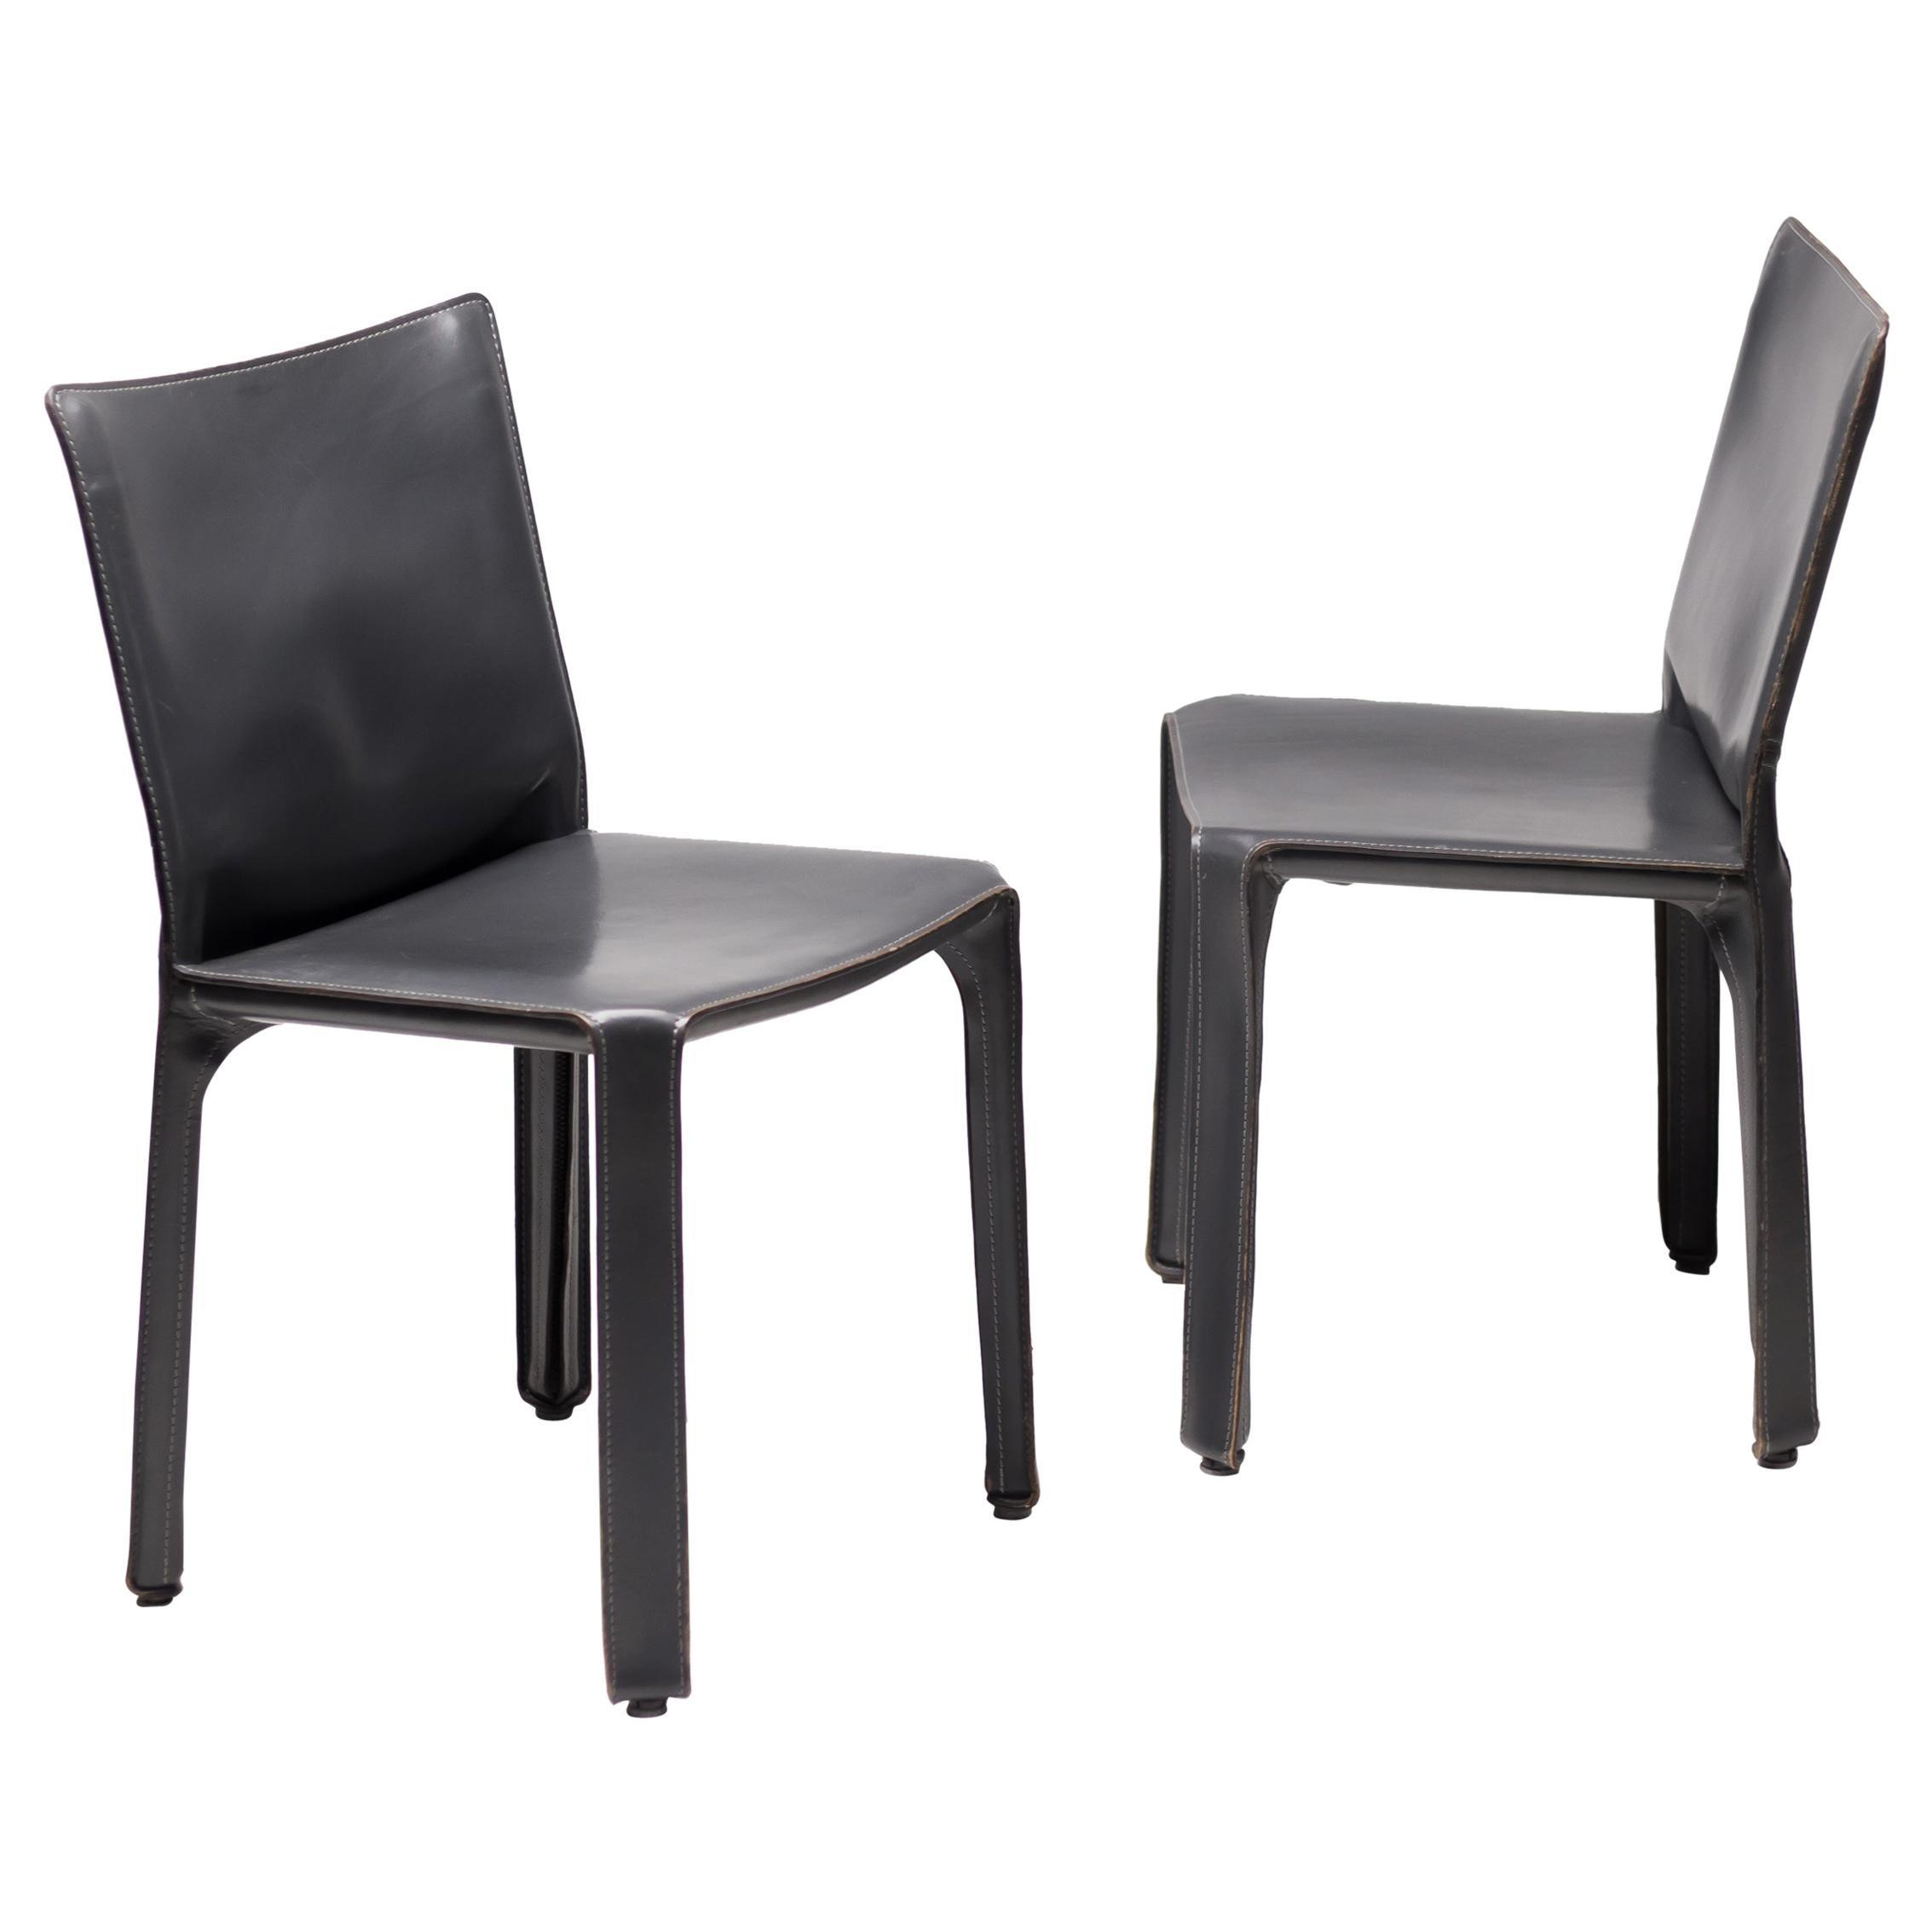 Pair of Mario Bellini Cab Chairs for Cassina